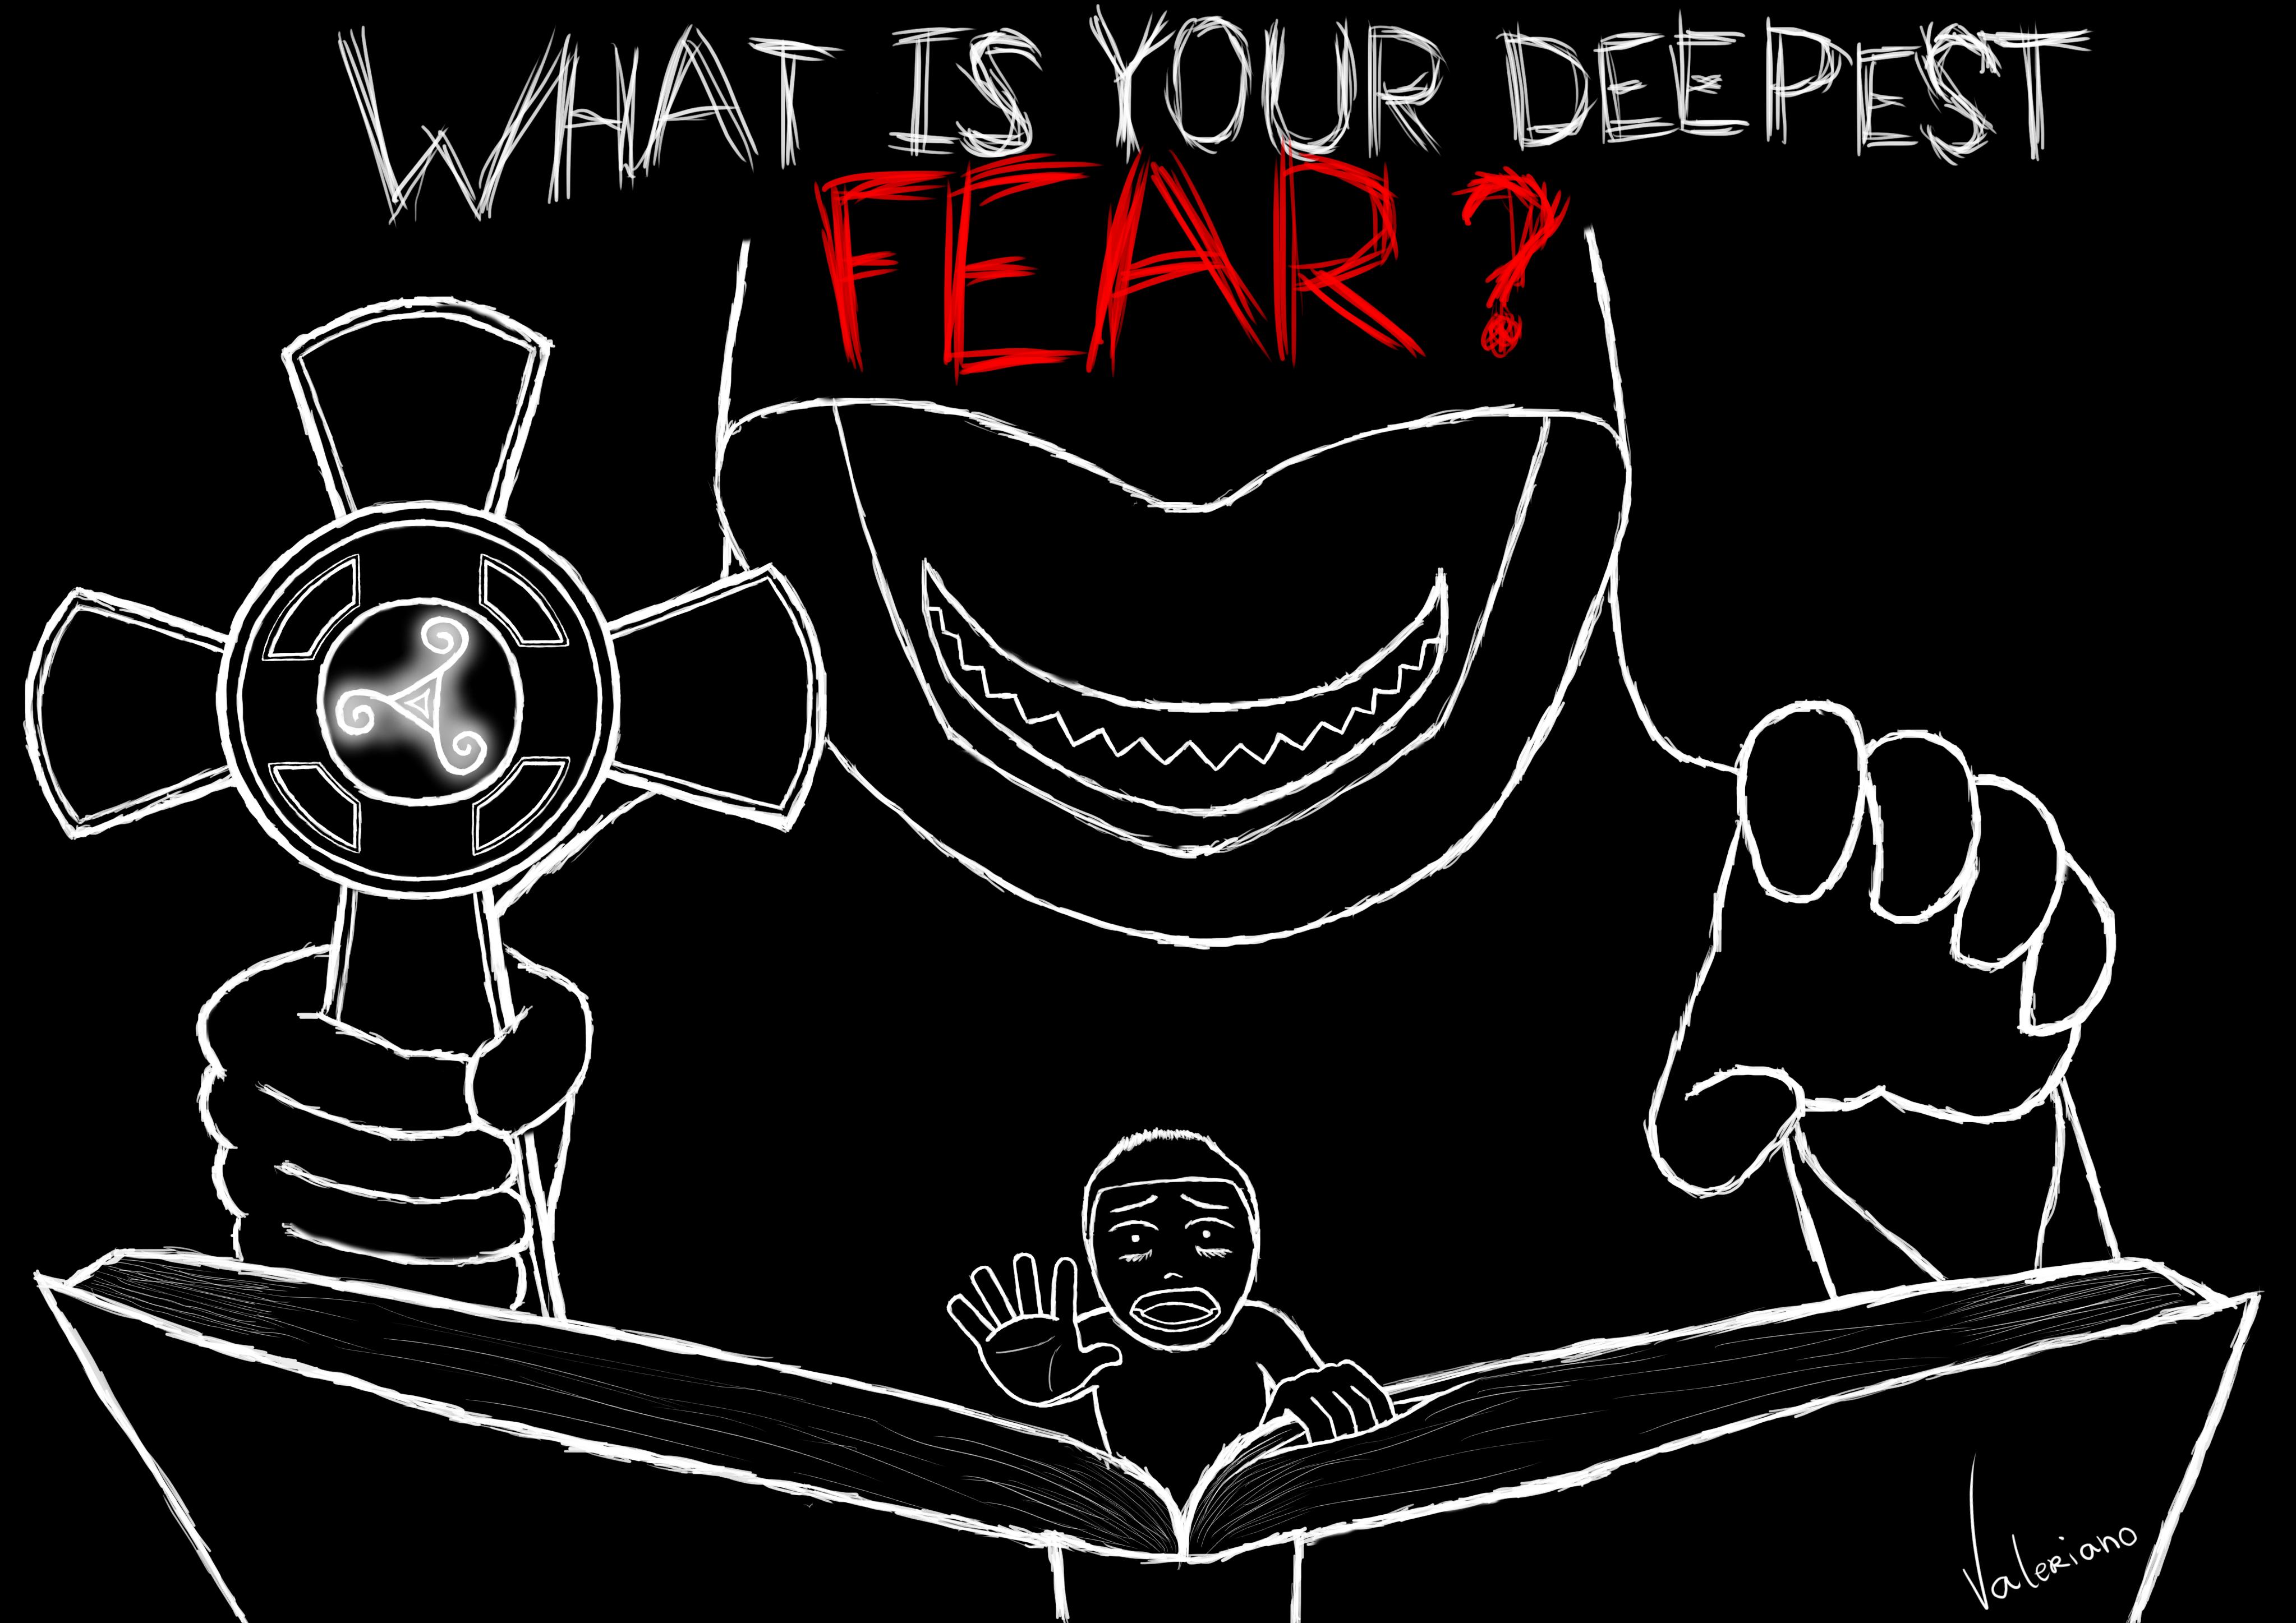 Deepest Fear - Return of TGEOP (Teaser)